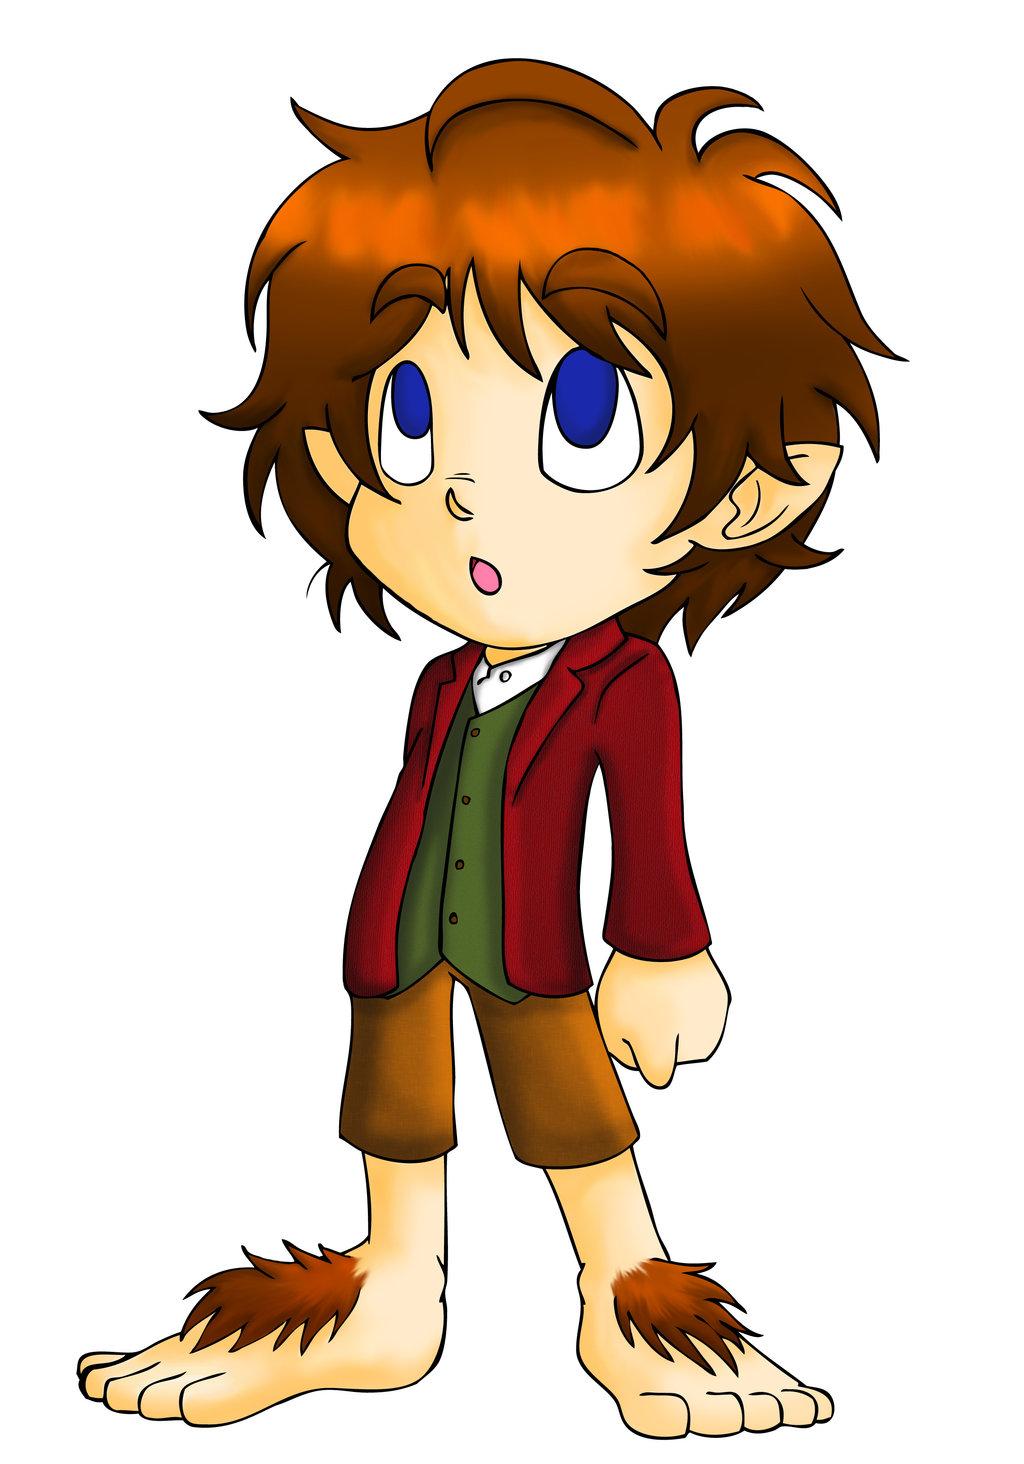 Bilbo Baggins clipart chibi Bilbo DeviantArt Hikaru Chibi by